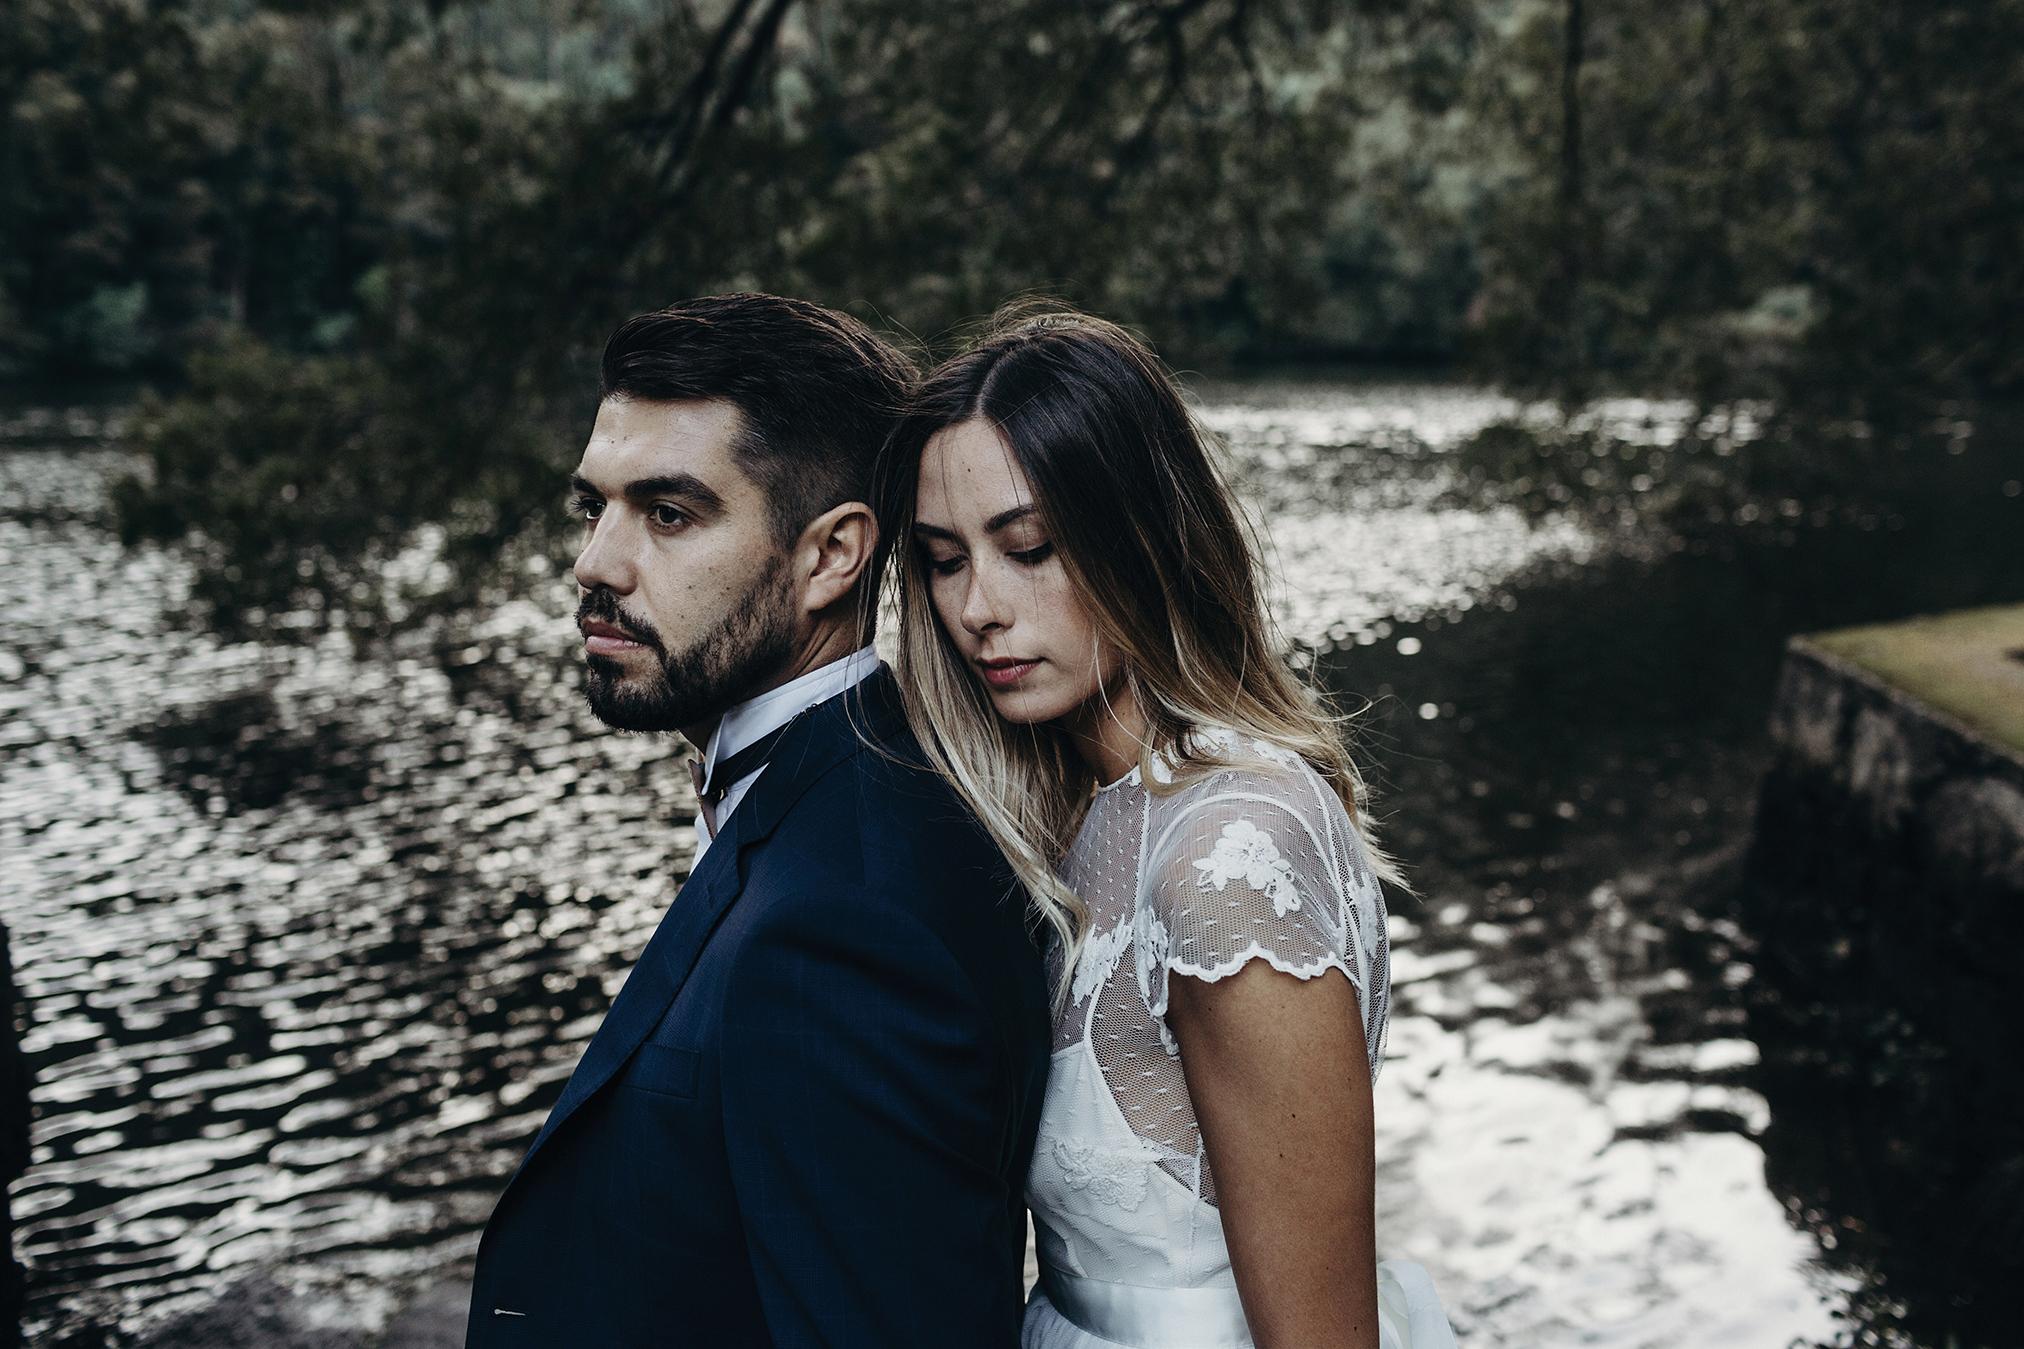 fotografo bodas Galicia Graciela Vilagudin Photography757.jpg